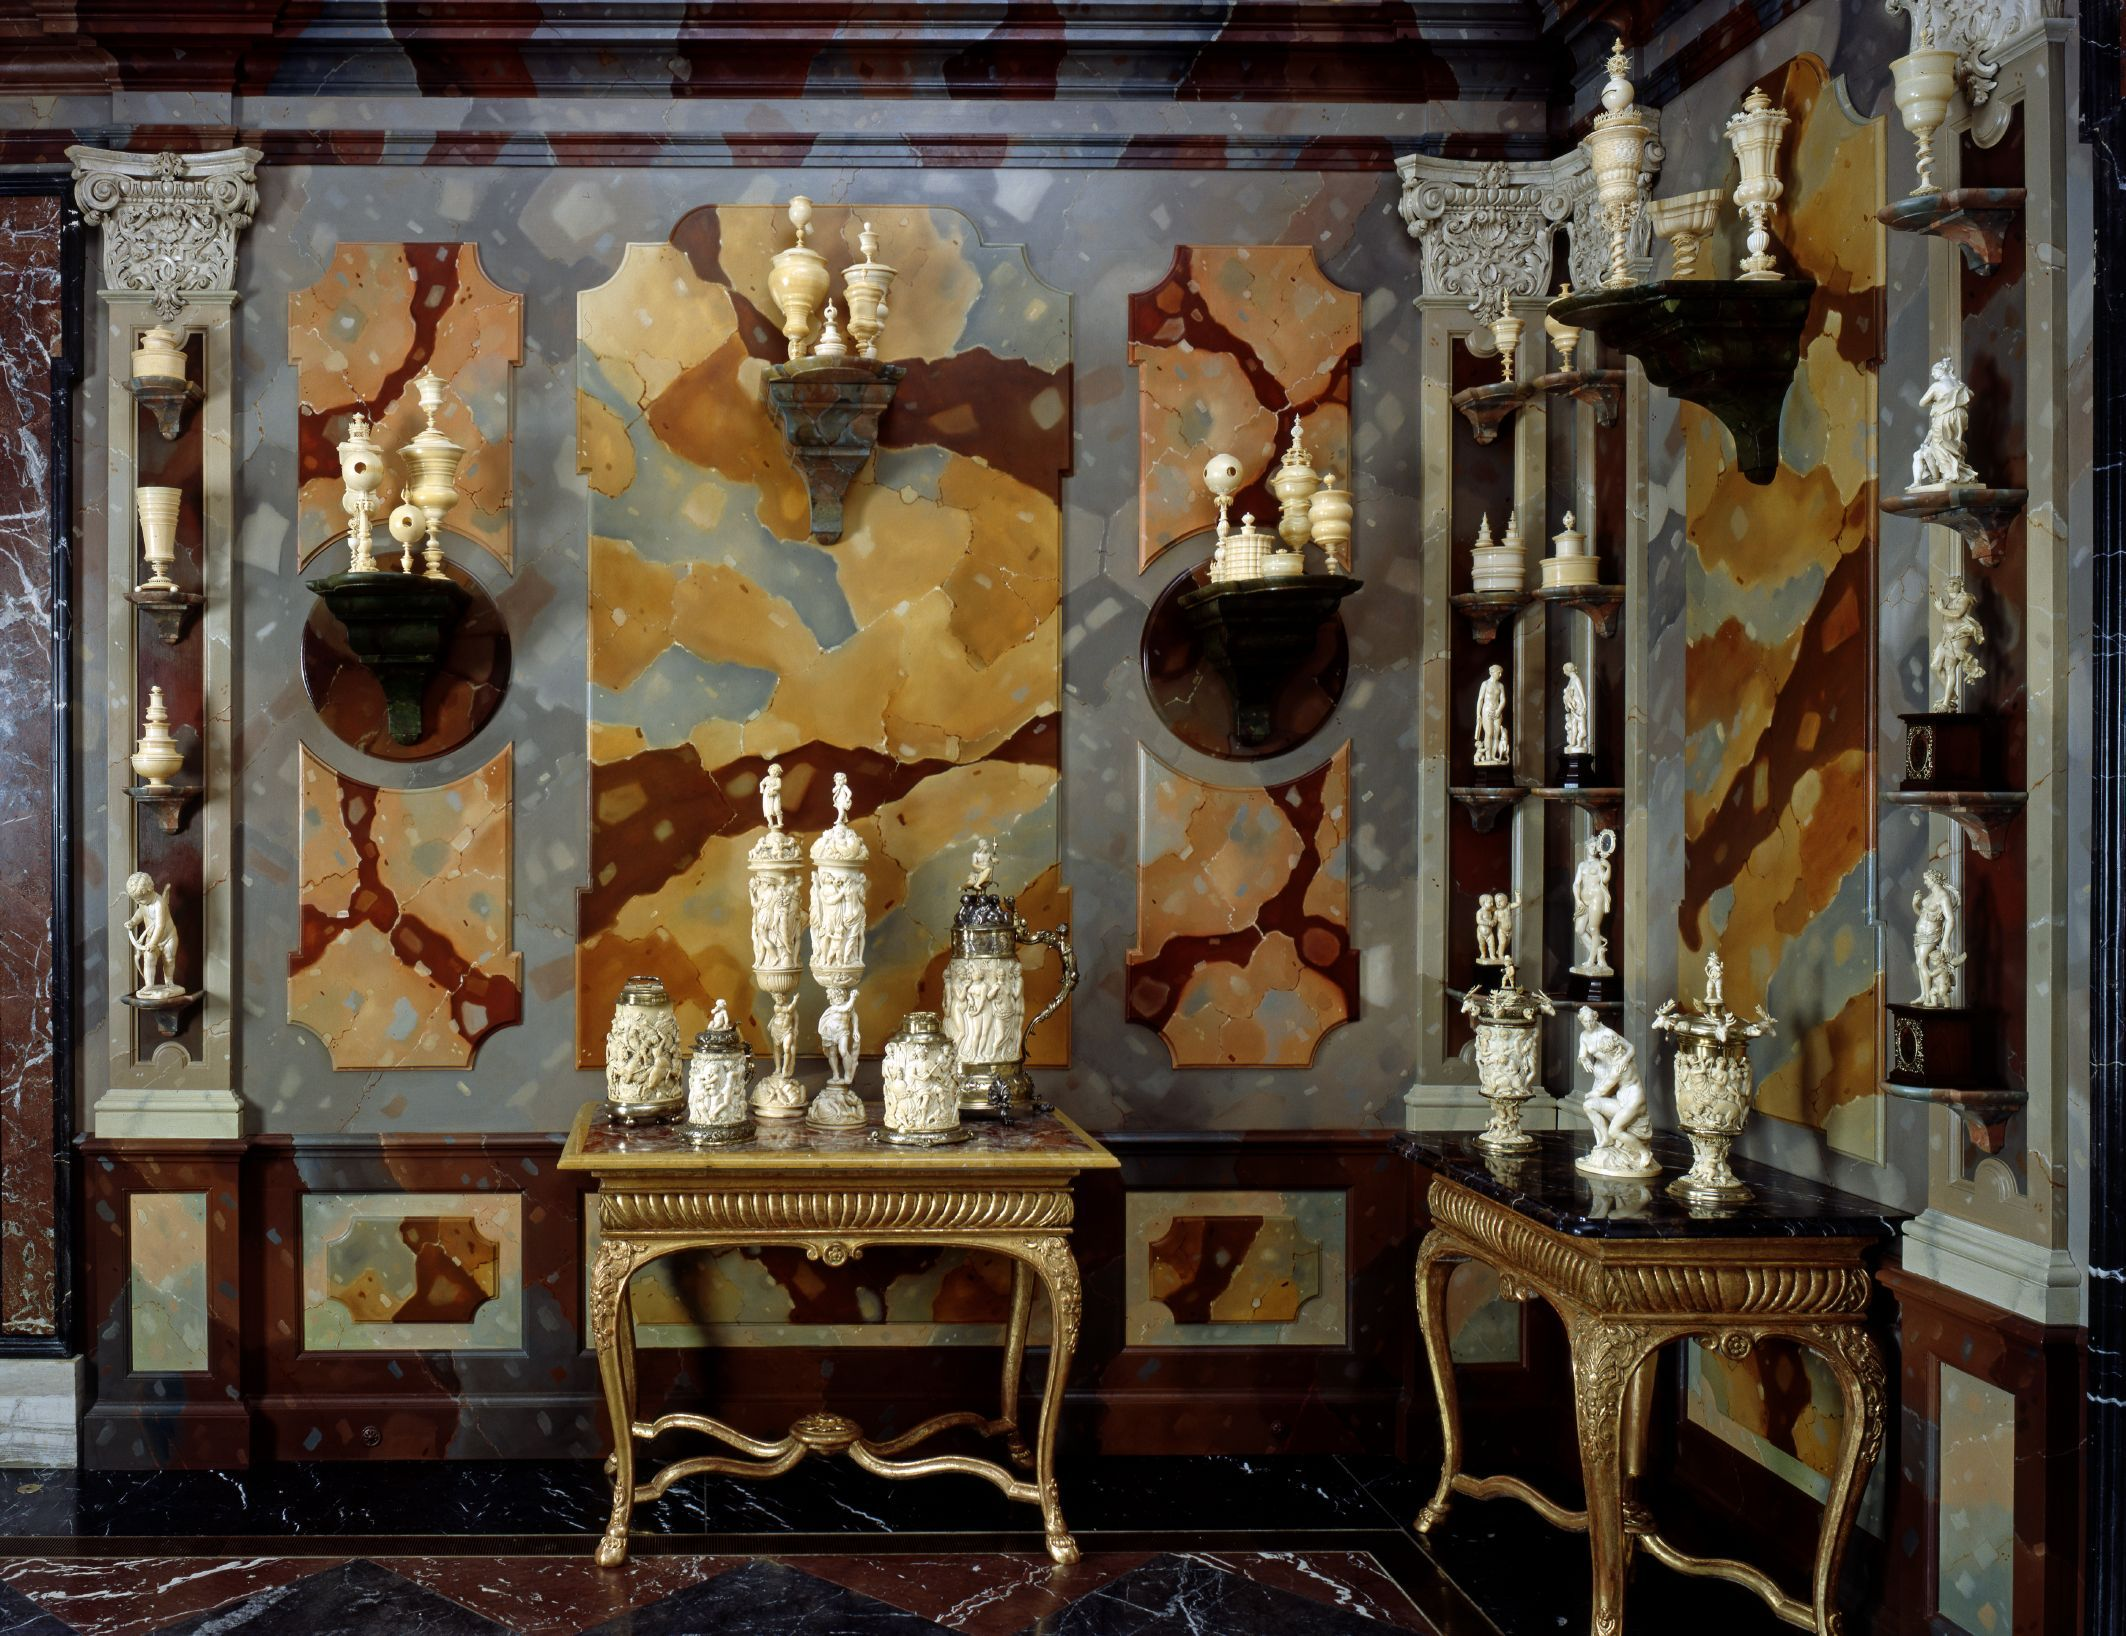 historisches gr nes gew lbe museumsnacht. Black Bedroom Furniture Sets. Home Design Ideas